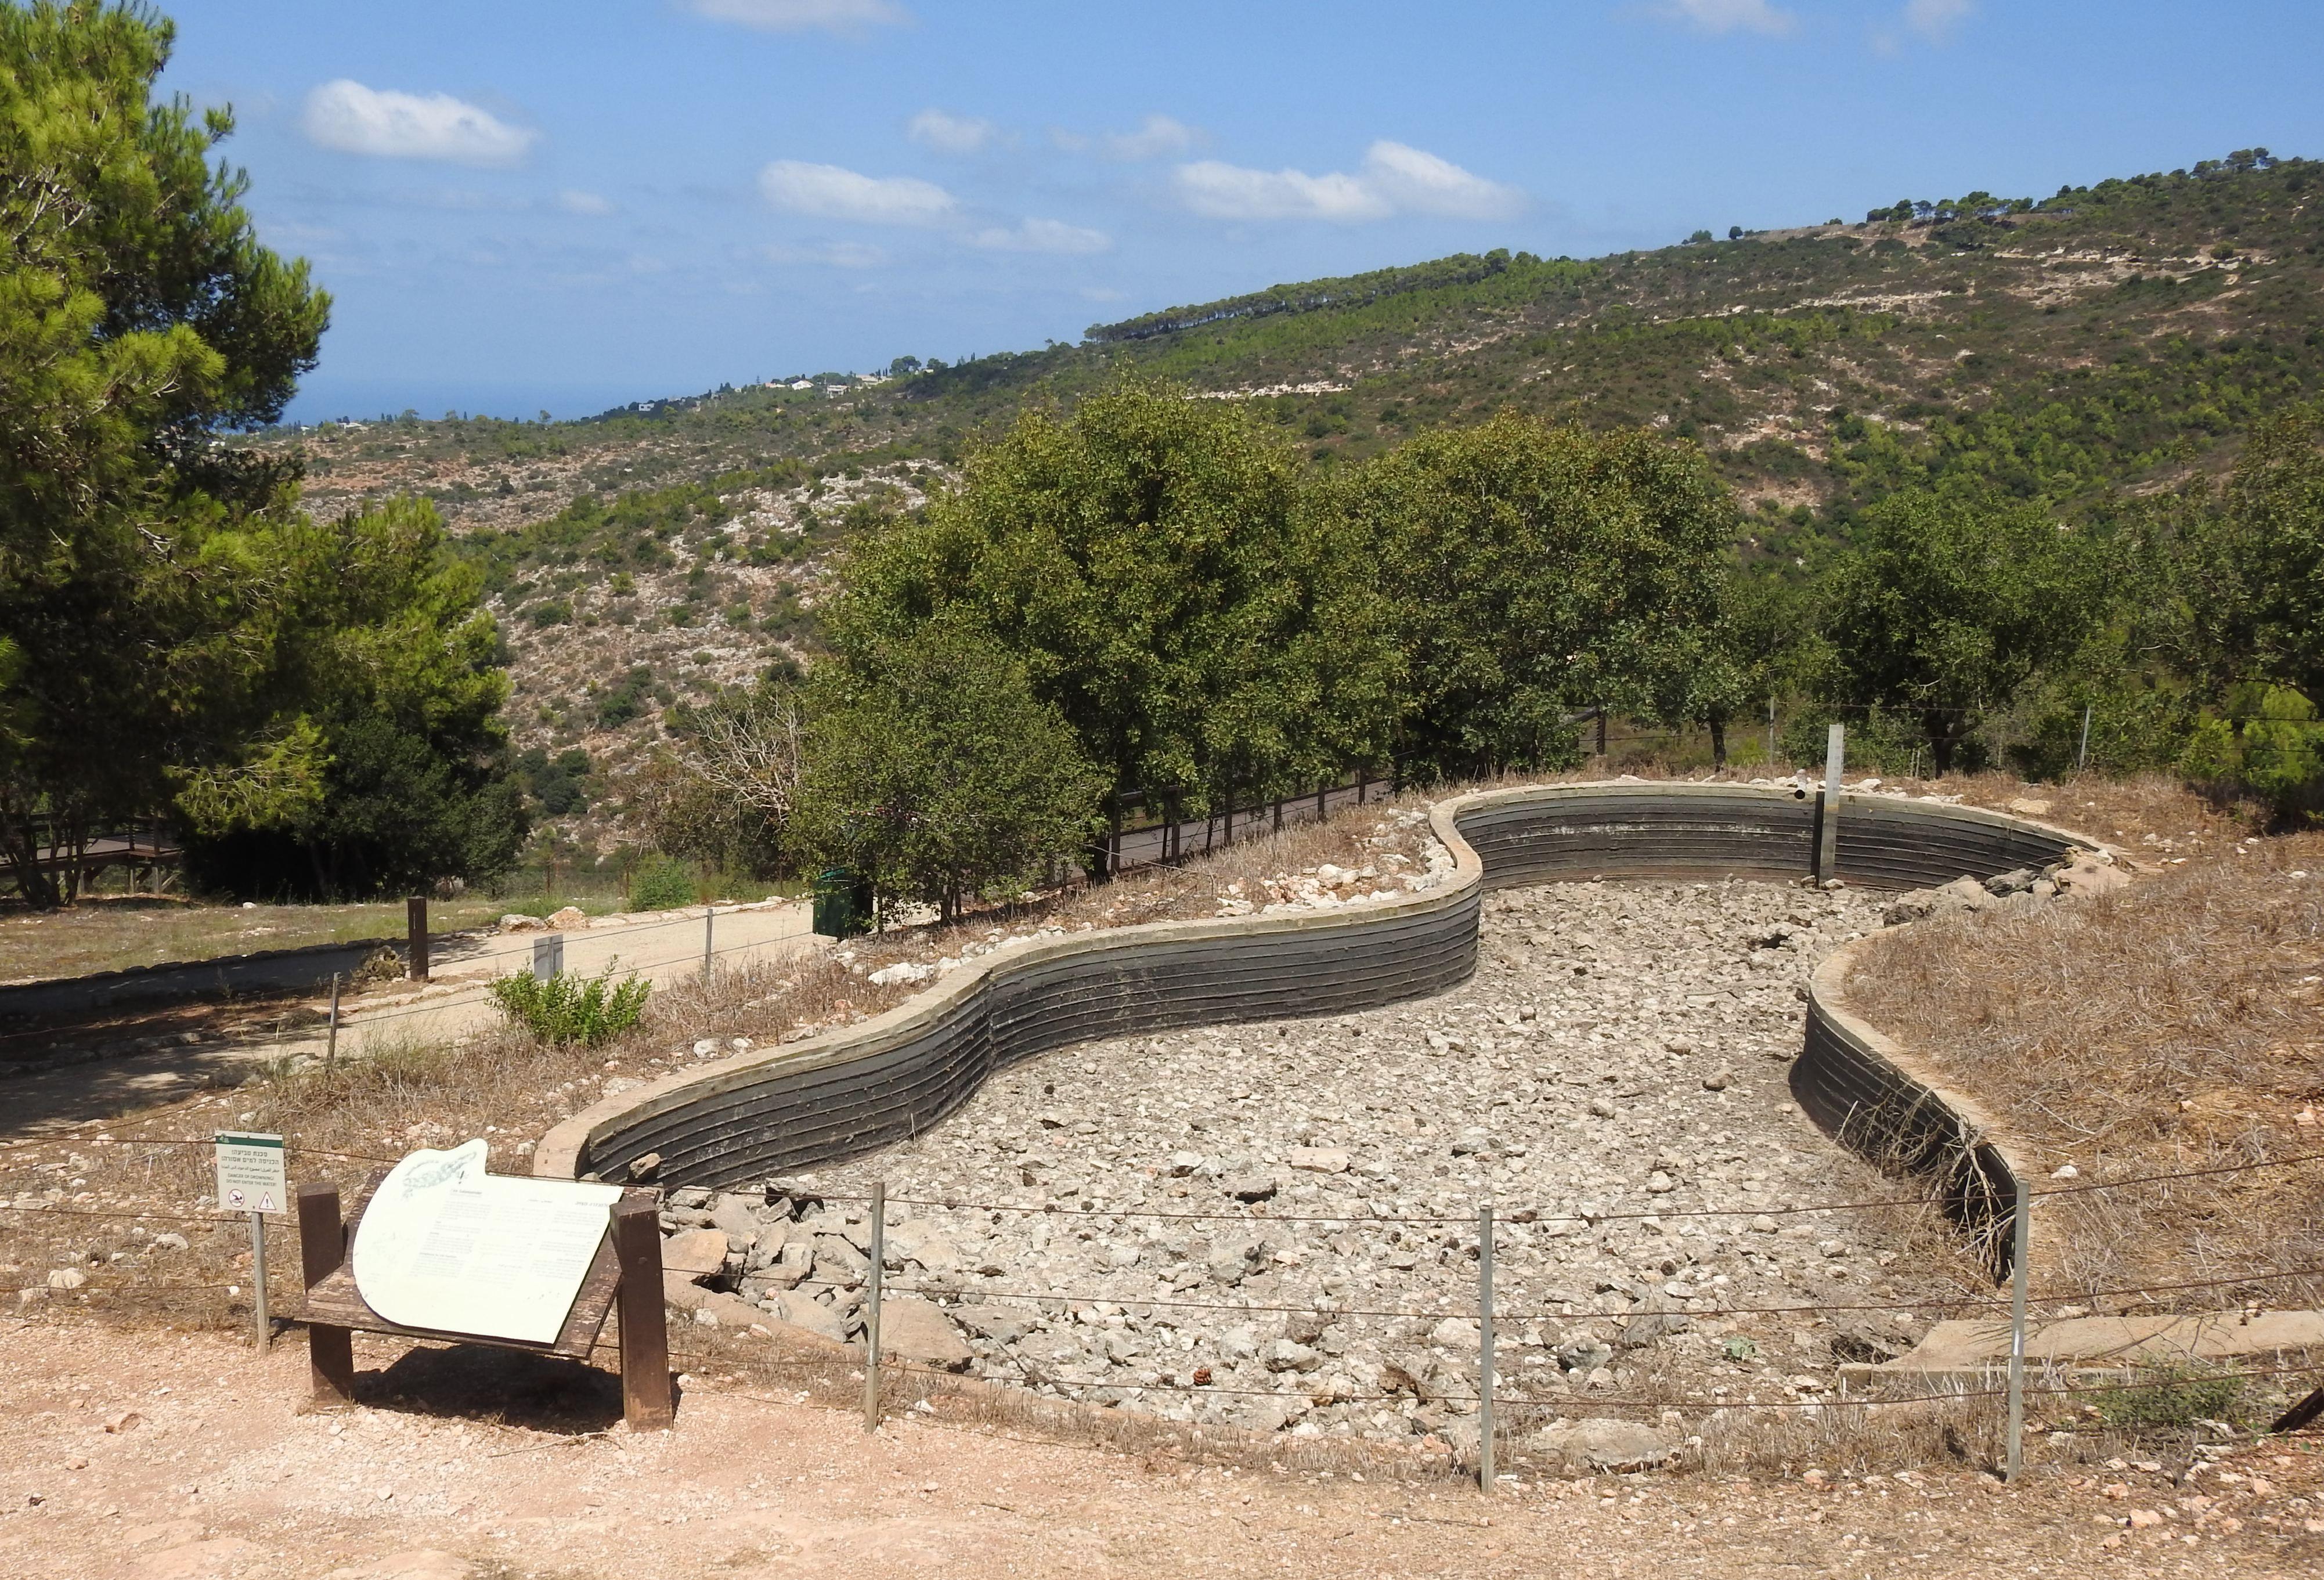 The dried fire salamander breeding pool